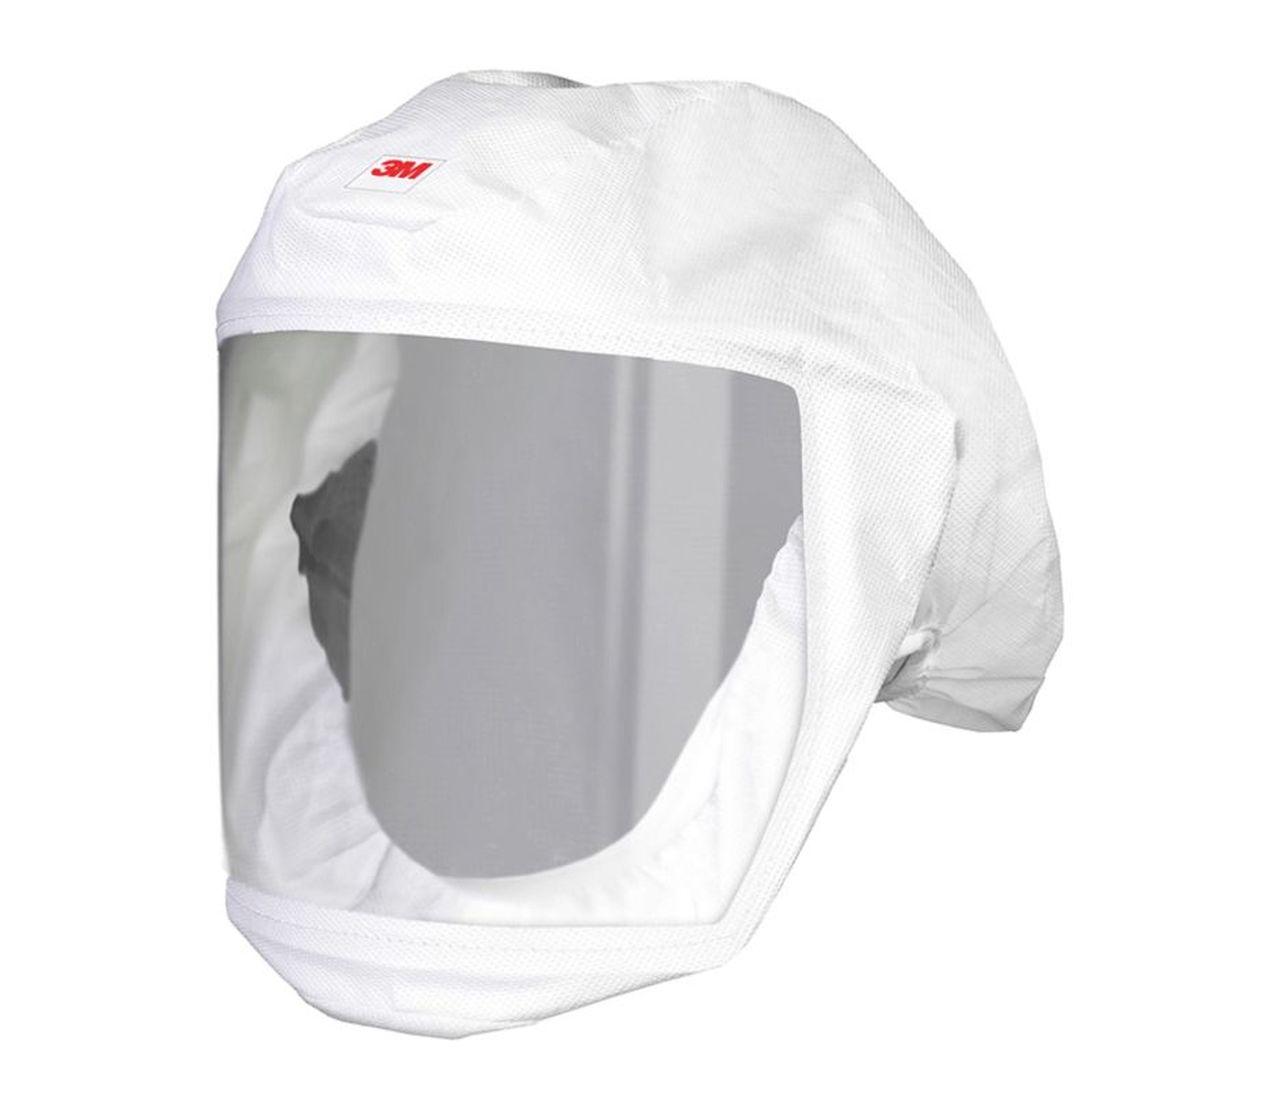 masque ventilée COVID